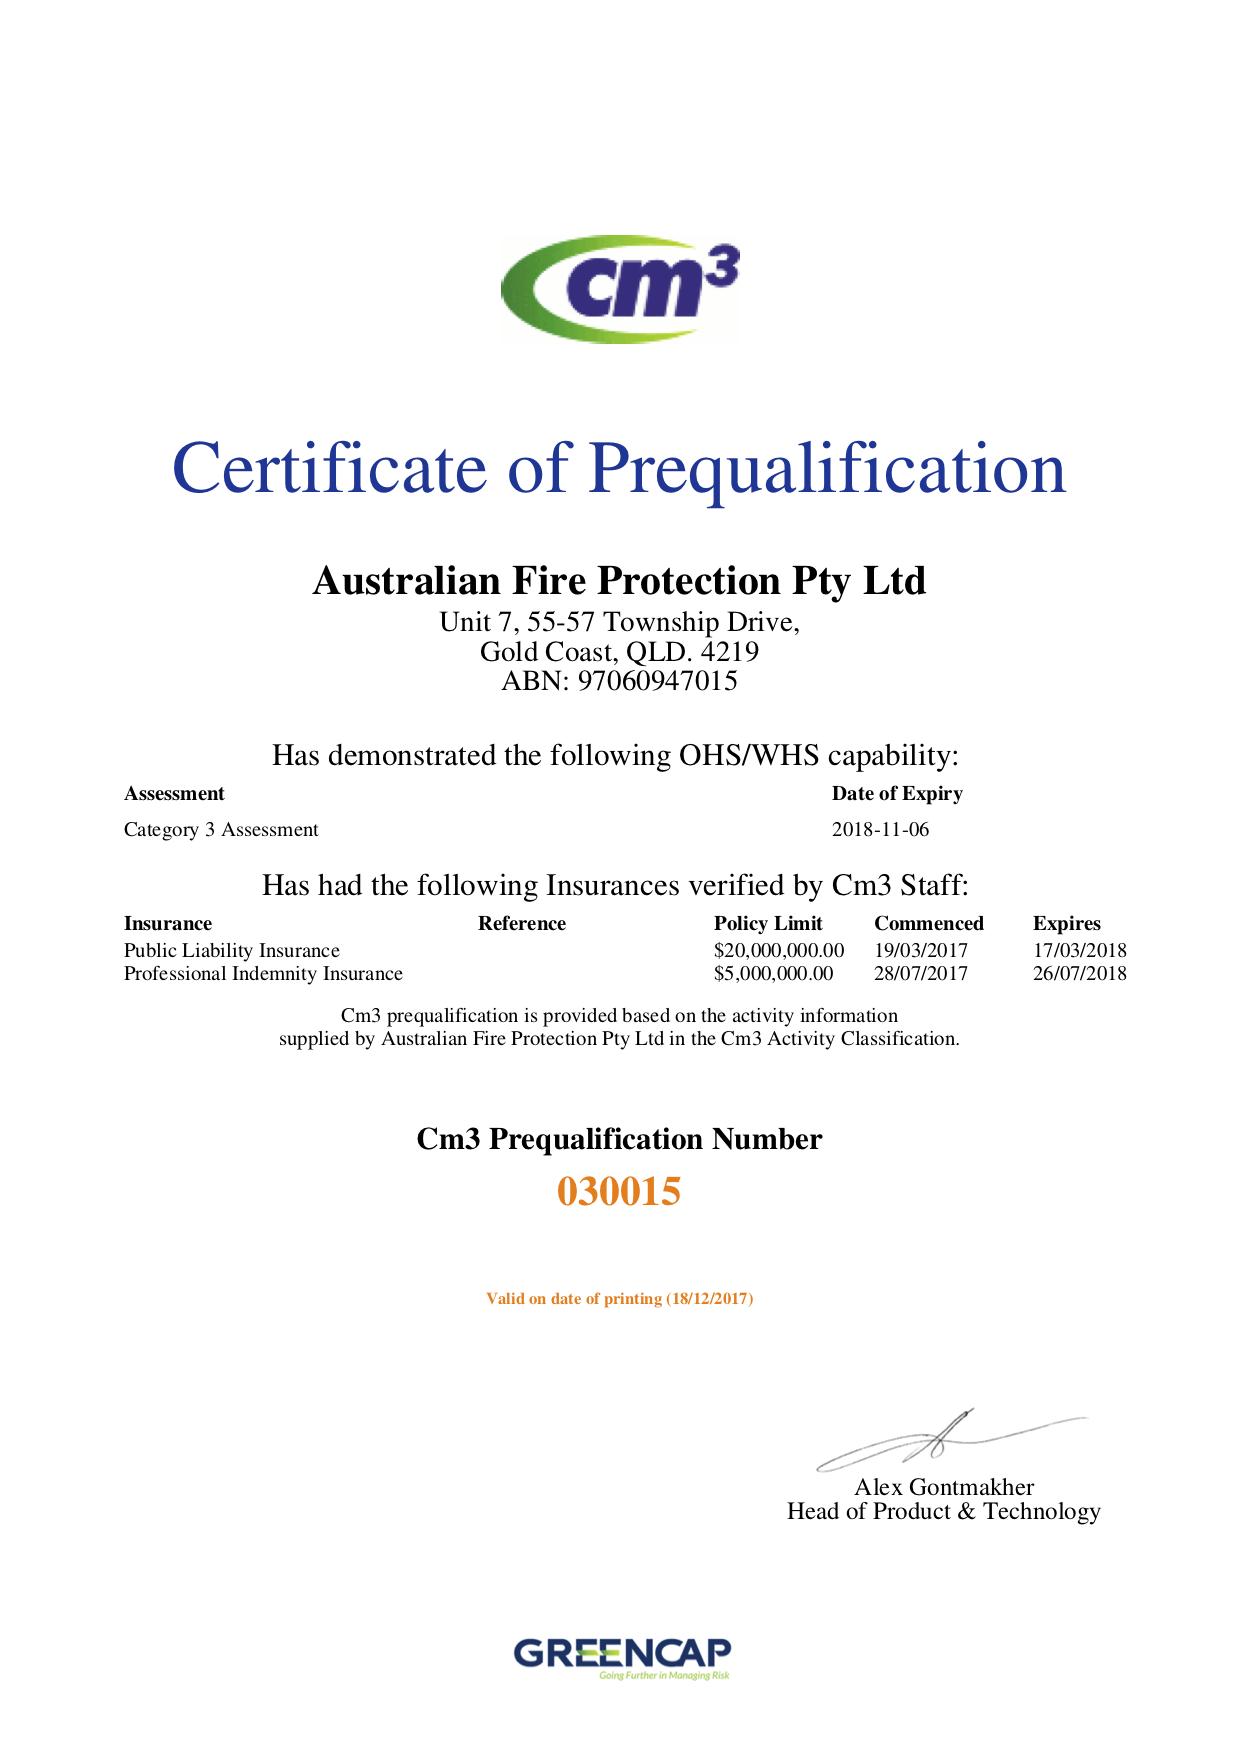 CM3 certificate